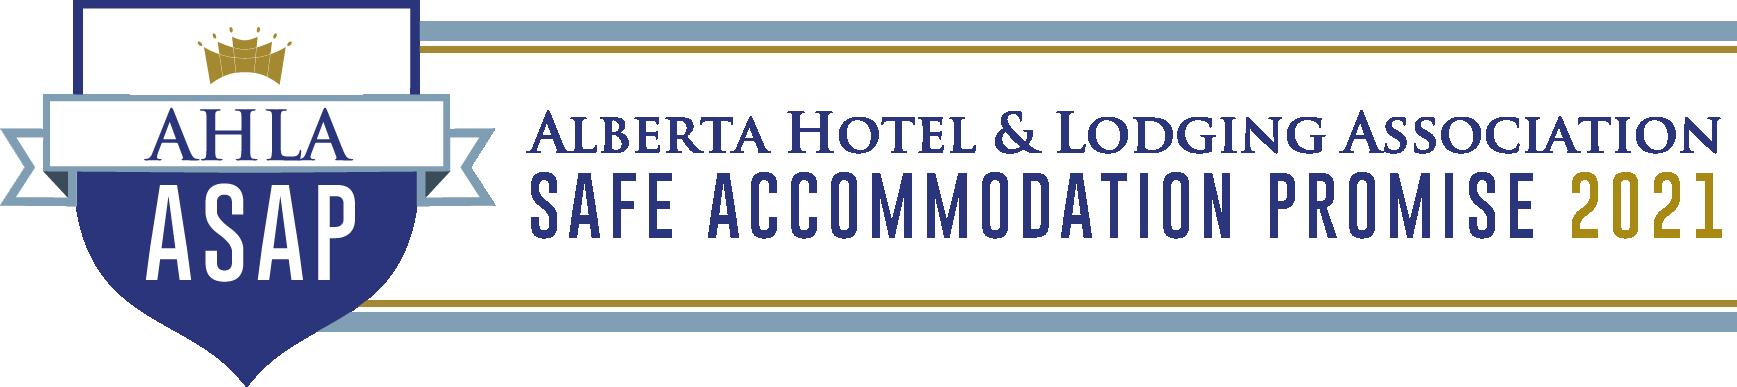 Alberta Hotel & Lodging Association - Safe Accommodation Promise